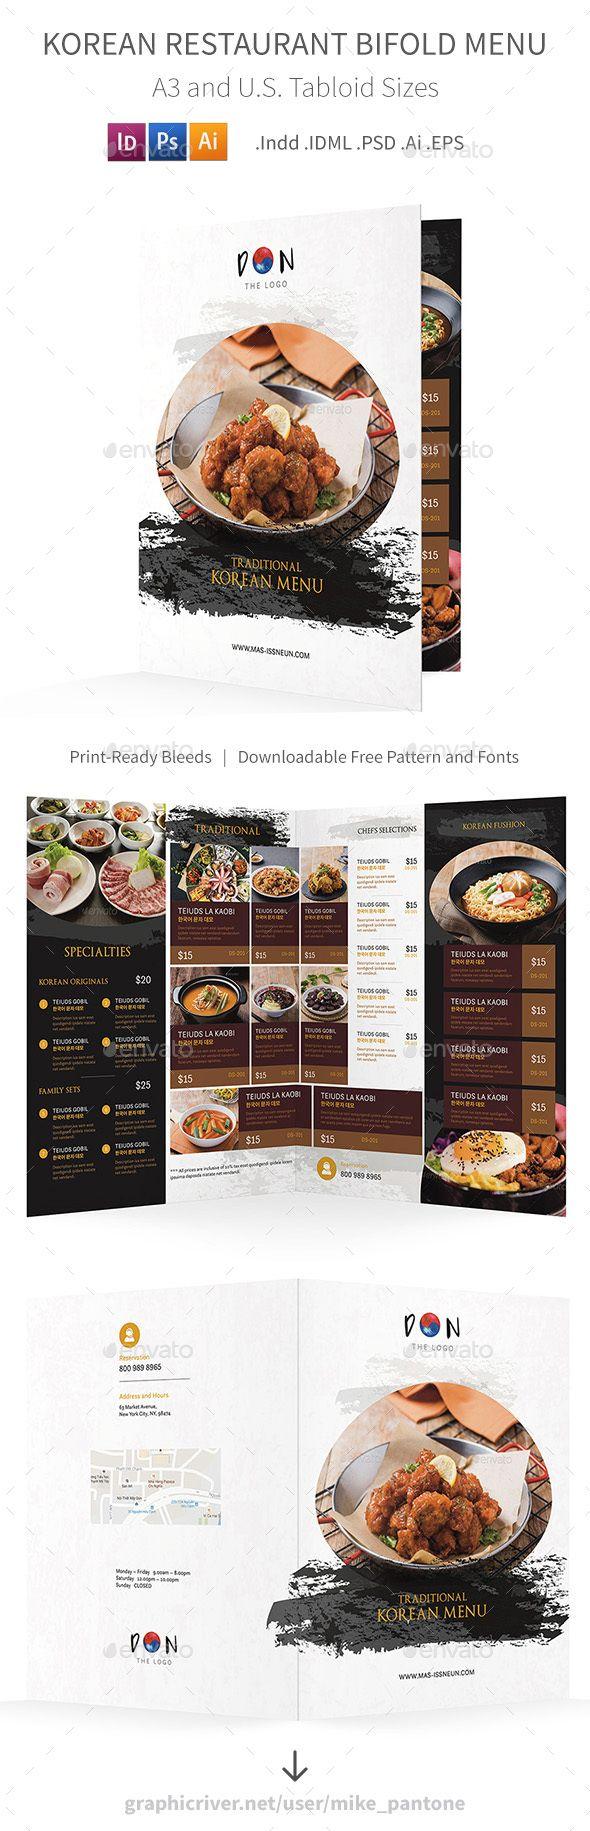 Korean Restaurant Bifold Halffold Brochure Ai Illustrator - Half fold brochure template free